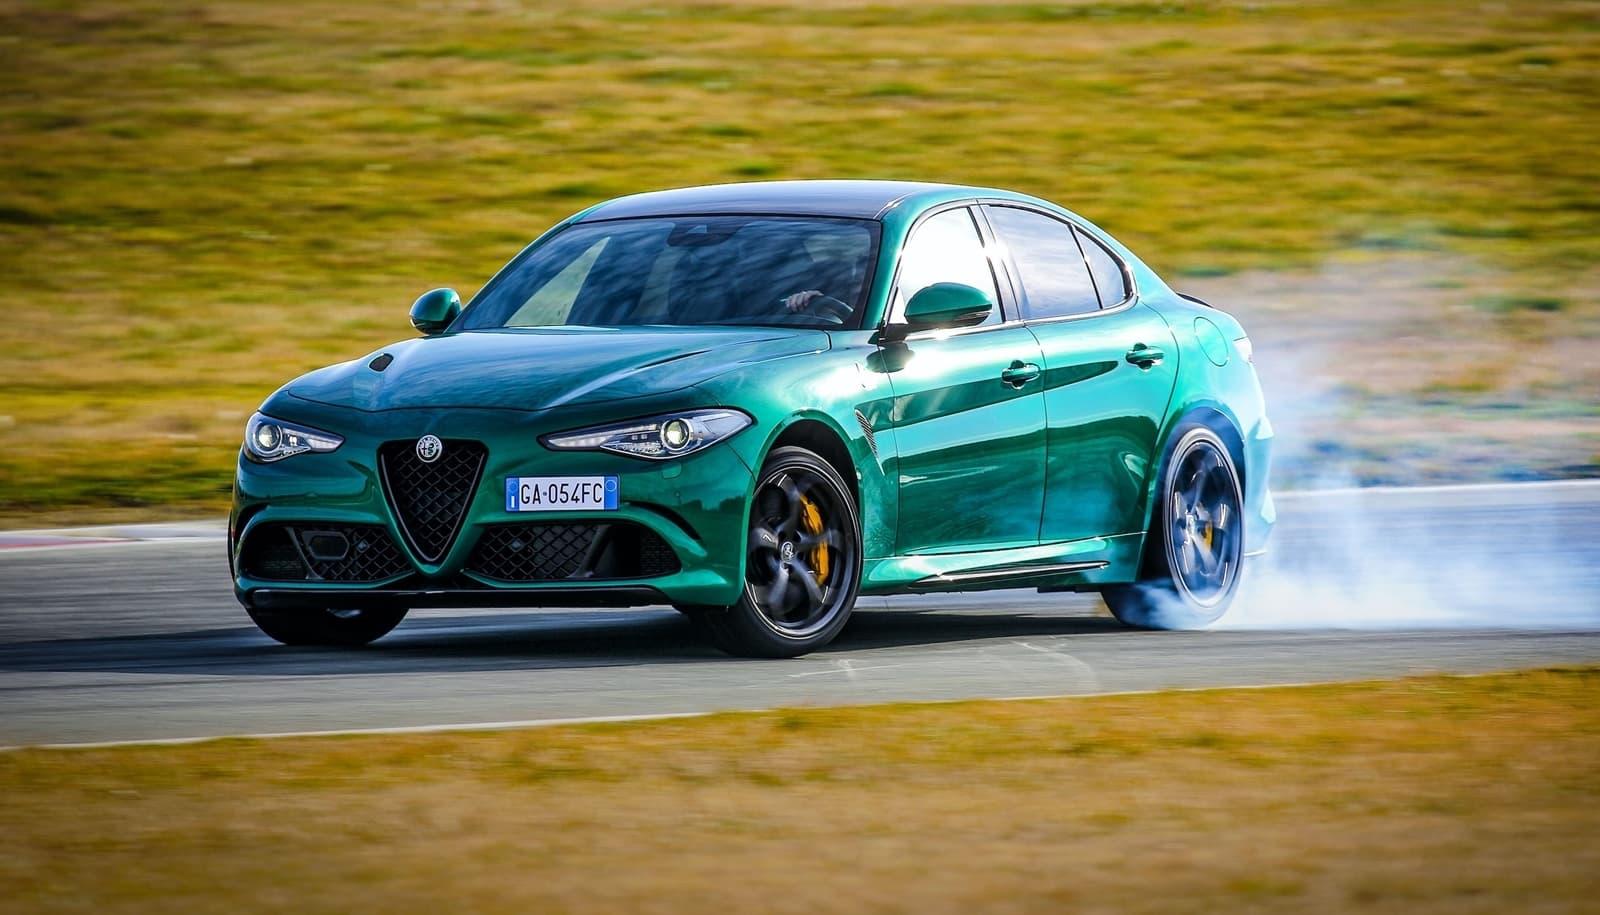 Alfa Romeo Giulia Stelvio Quadrifoglio 2020 0520 001